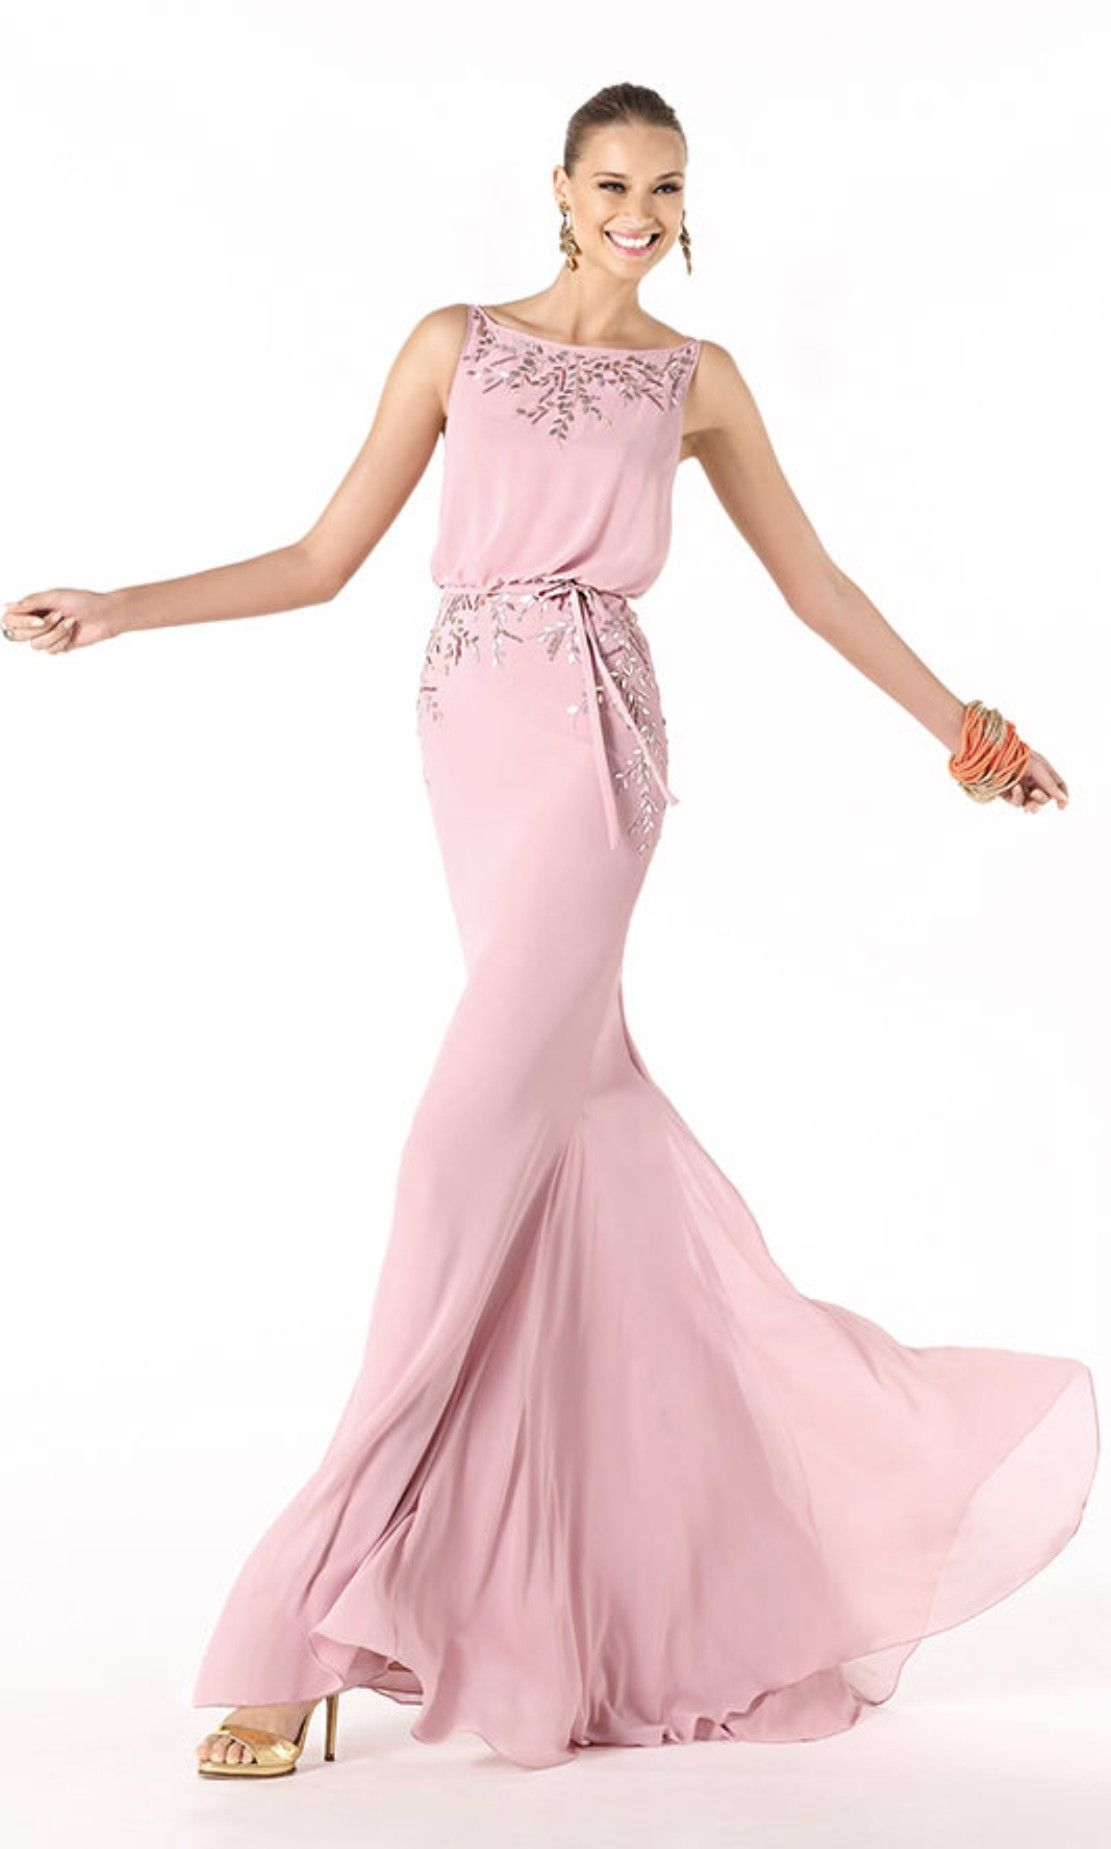 Pronovias 2014 | Vestidos de noche y matrimonio | Pinterest ...